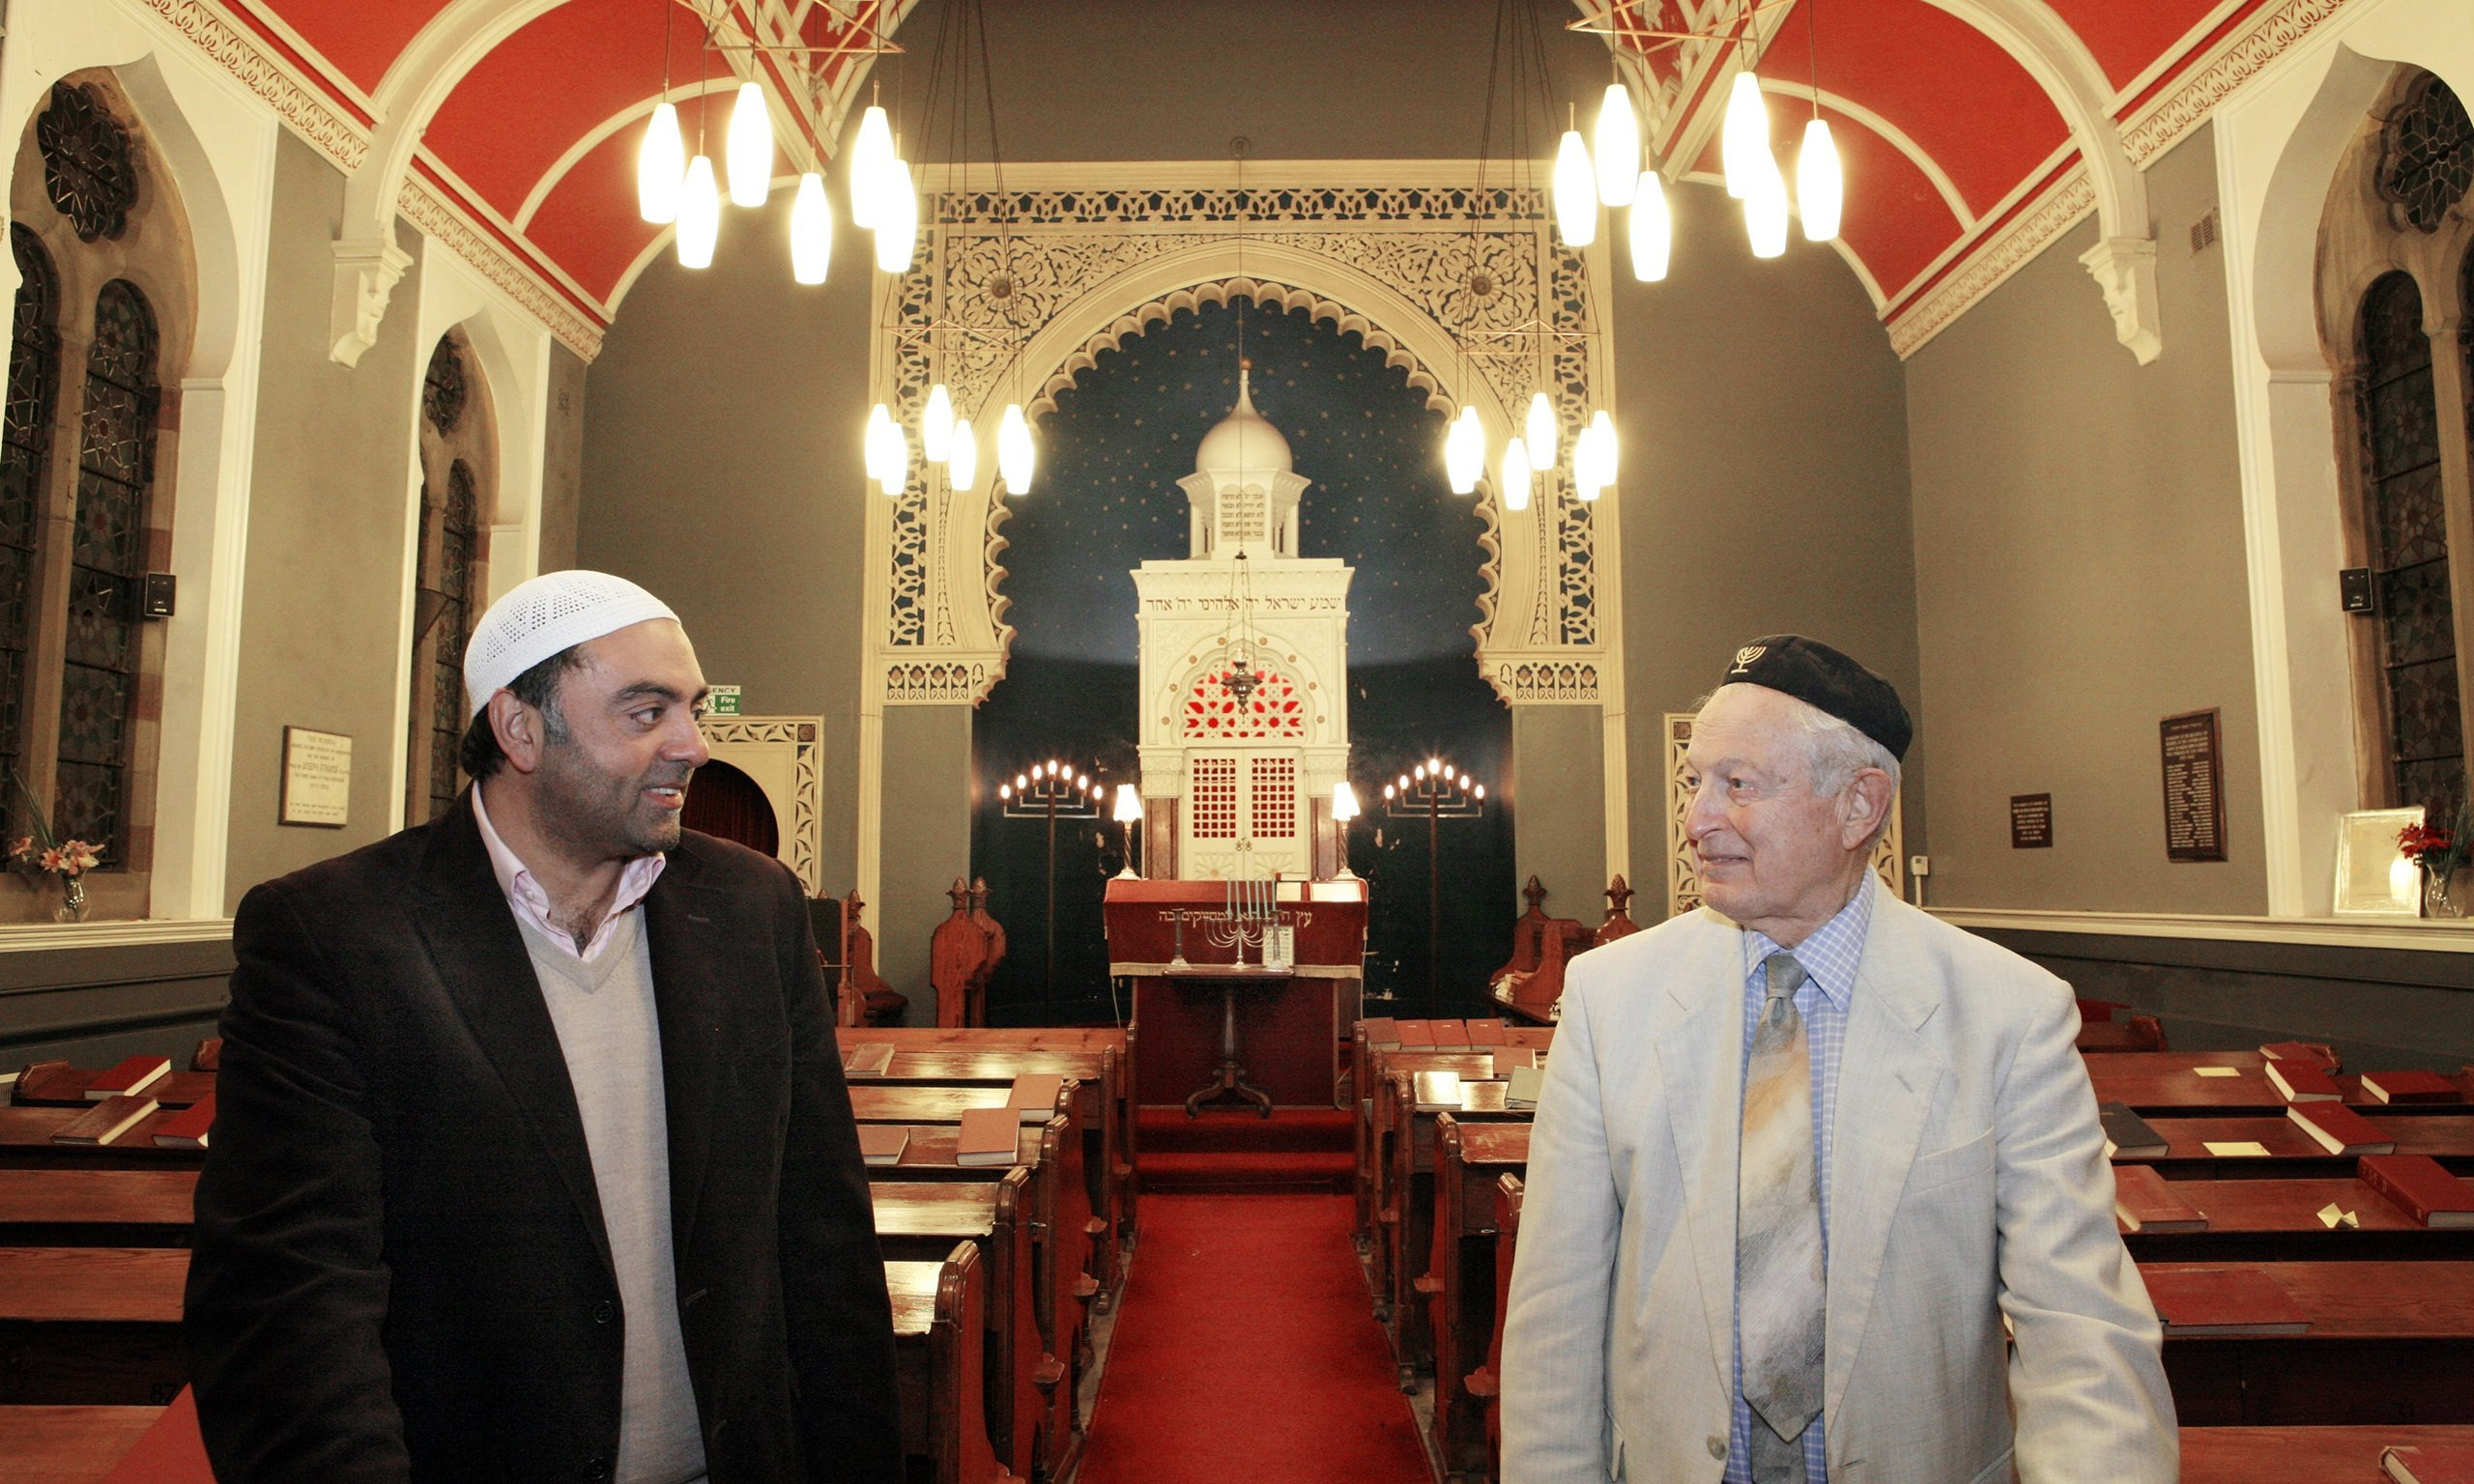 Bradford Reform Synagogue. Zulfi Karim, secretary of Bradford Council of Mosques, and Rudi Leavor, chairman of the synagogue. Photo: Gary Calton.